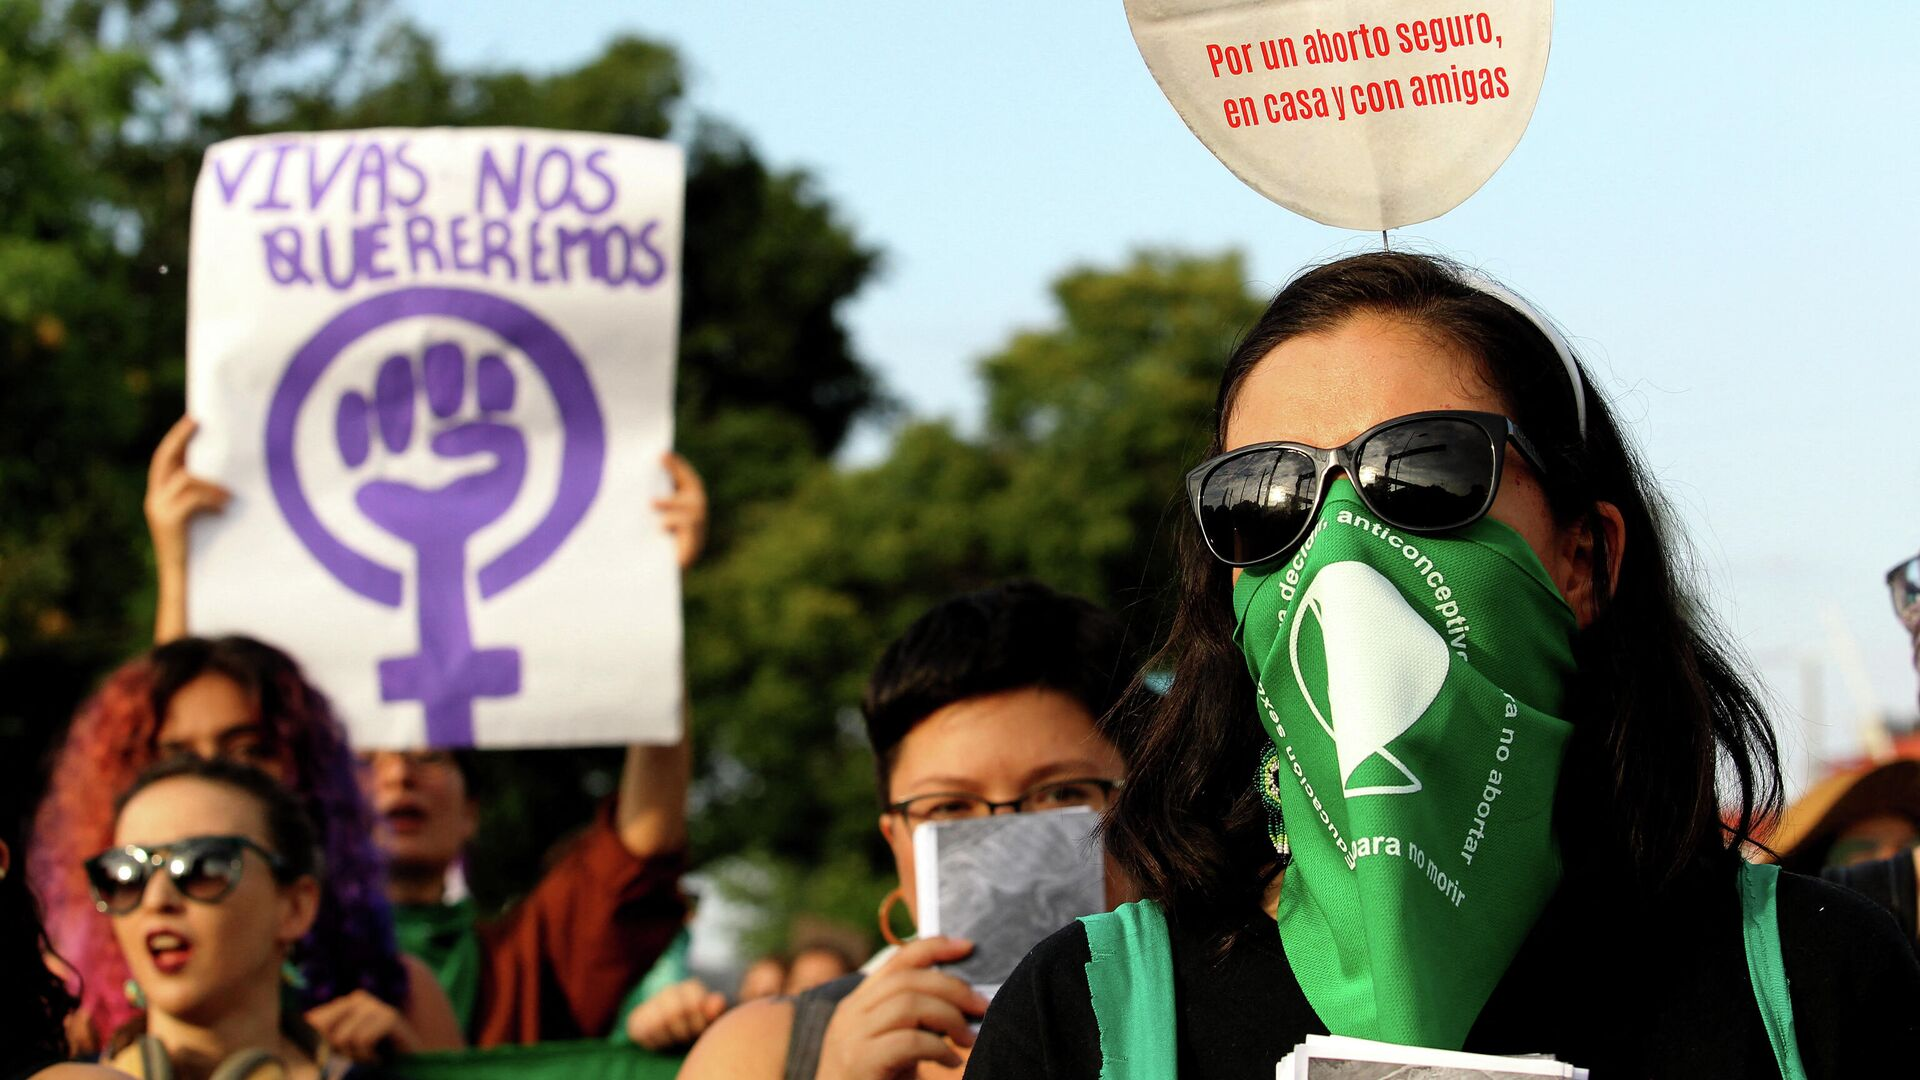 Protesta en favor del aborto en México - Sputnik Mundo, 1920, 24.09.2021